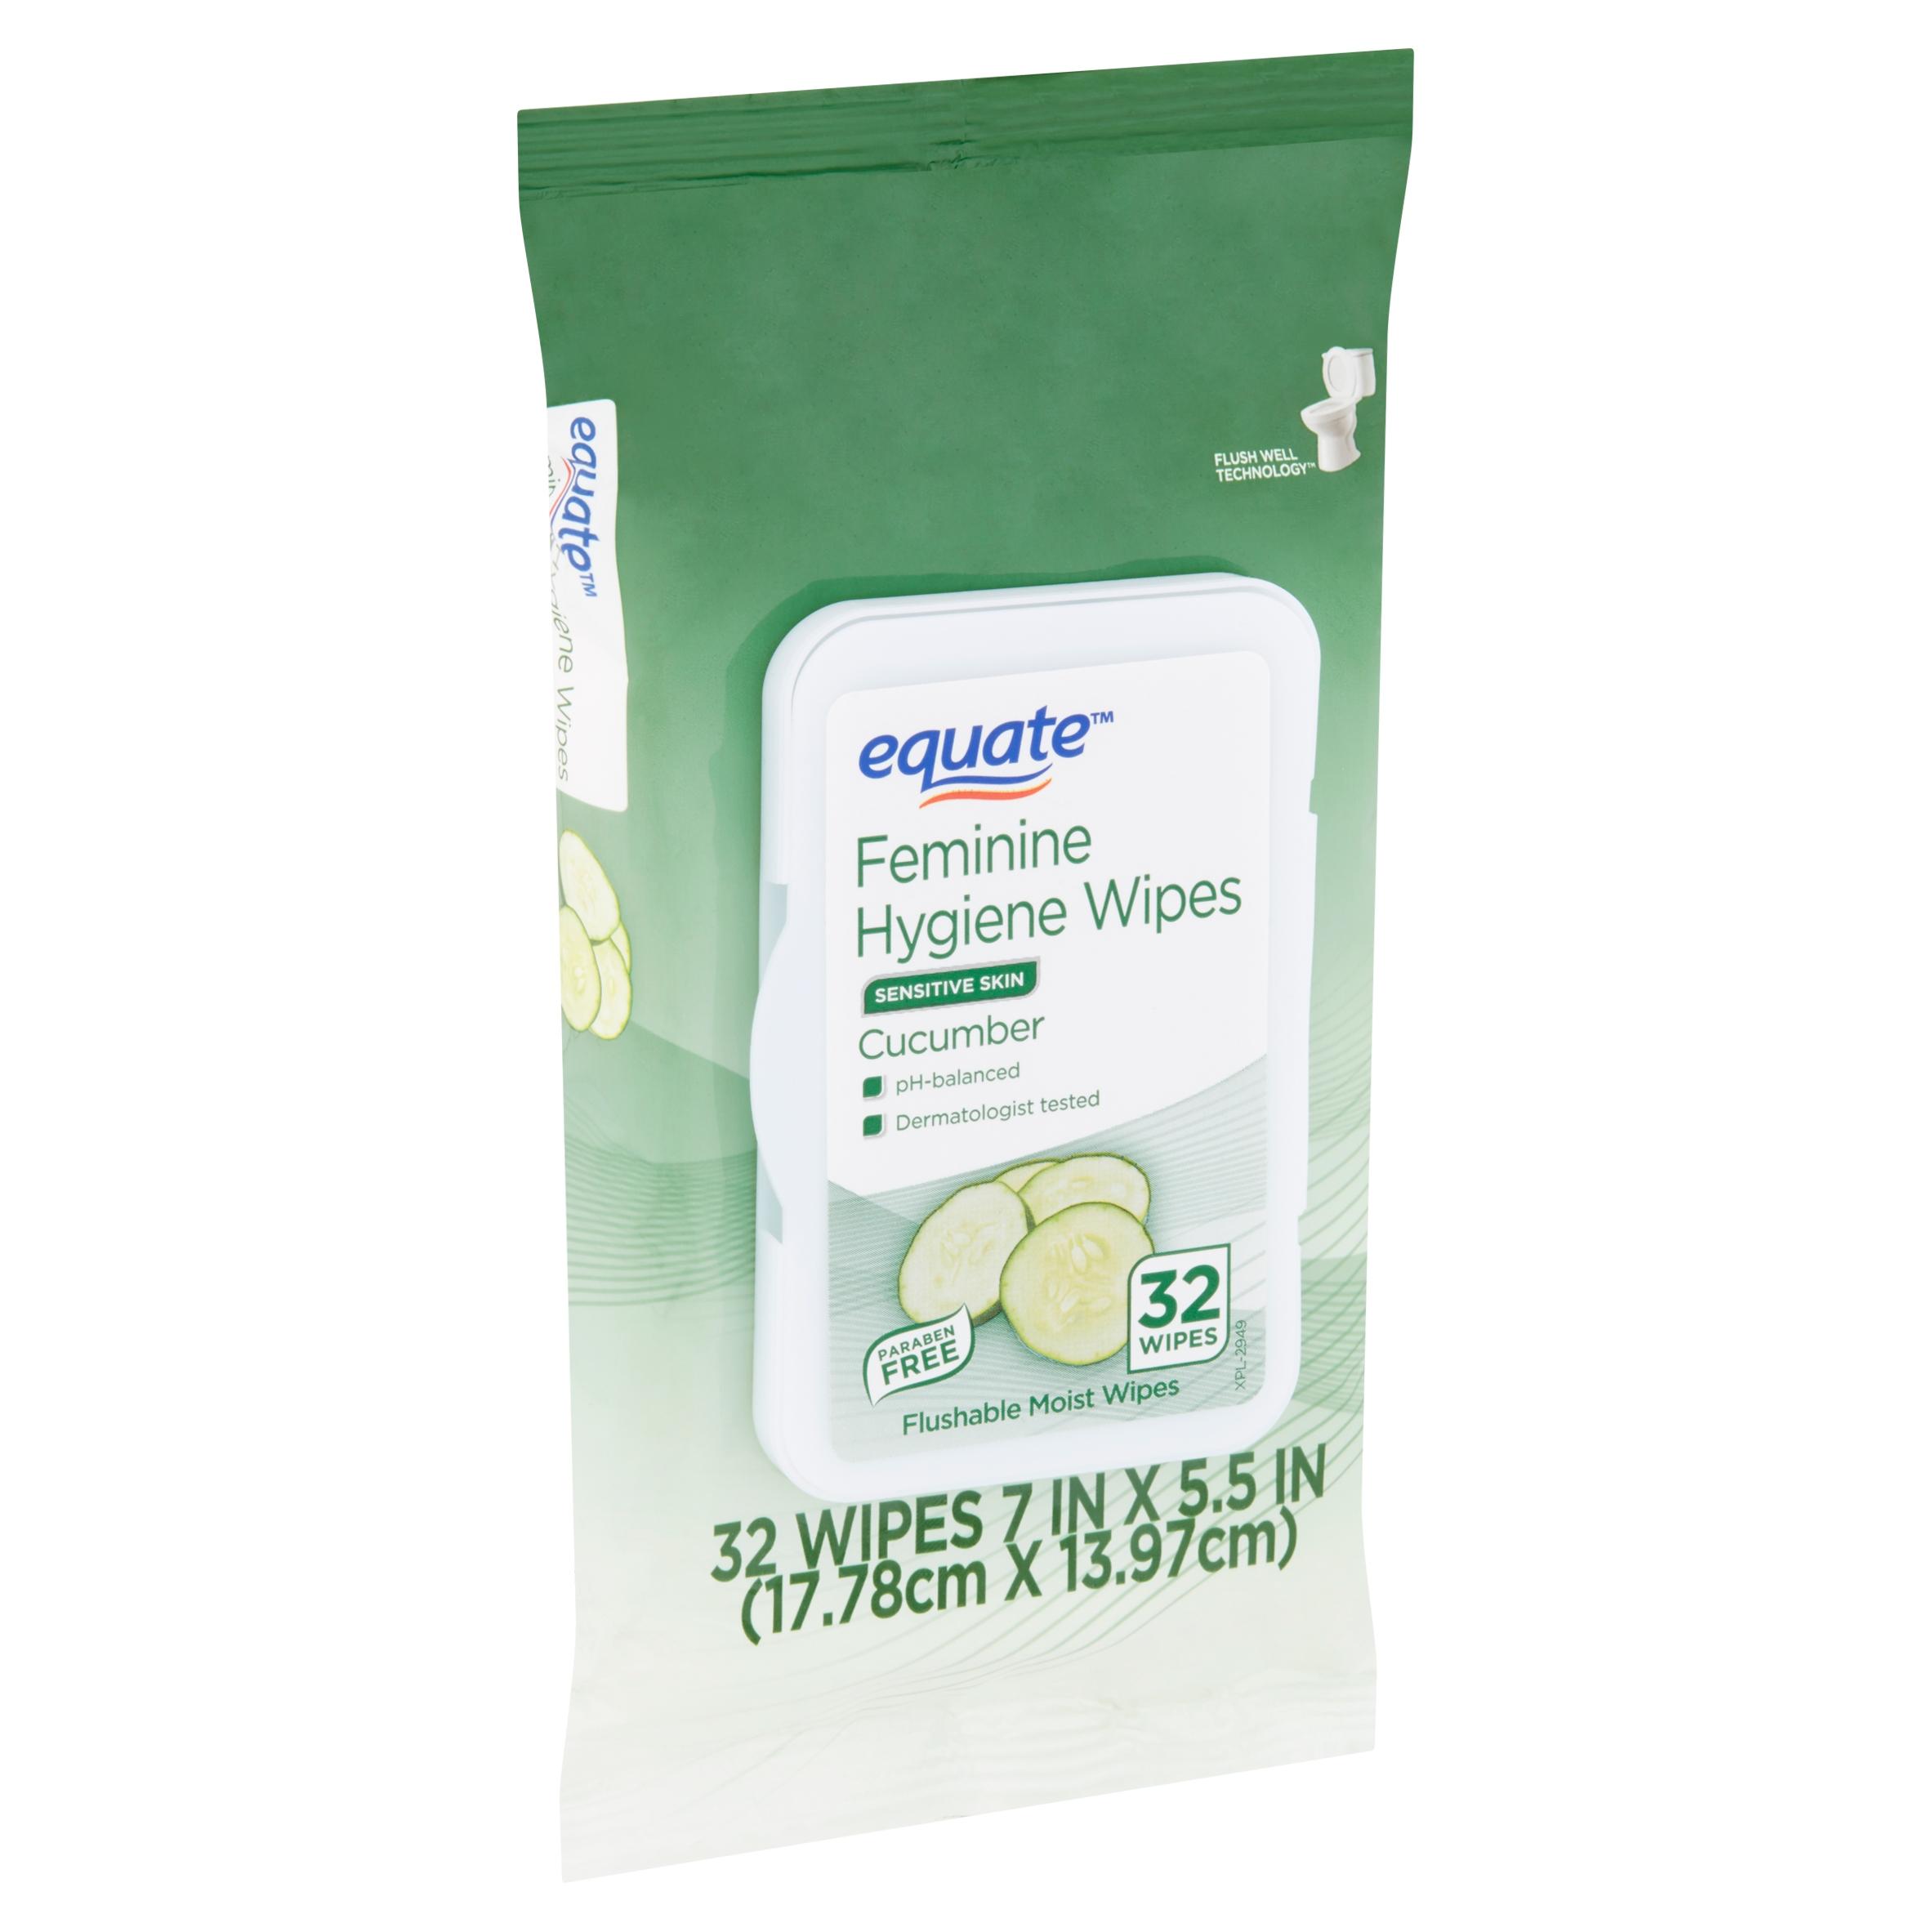 Equate Cucumber Feminine Hygiene Wipes, 32 count